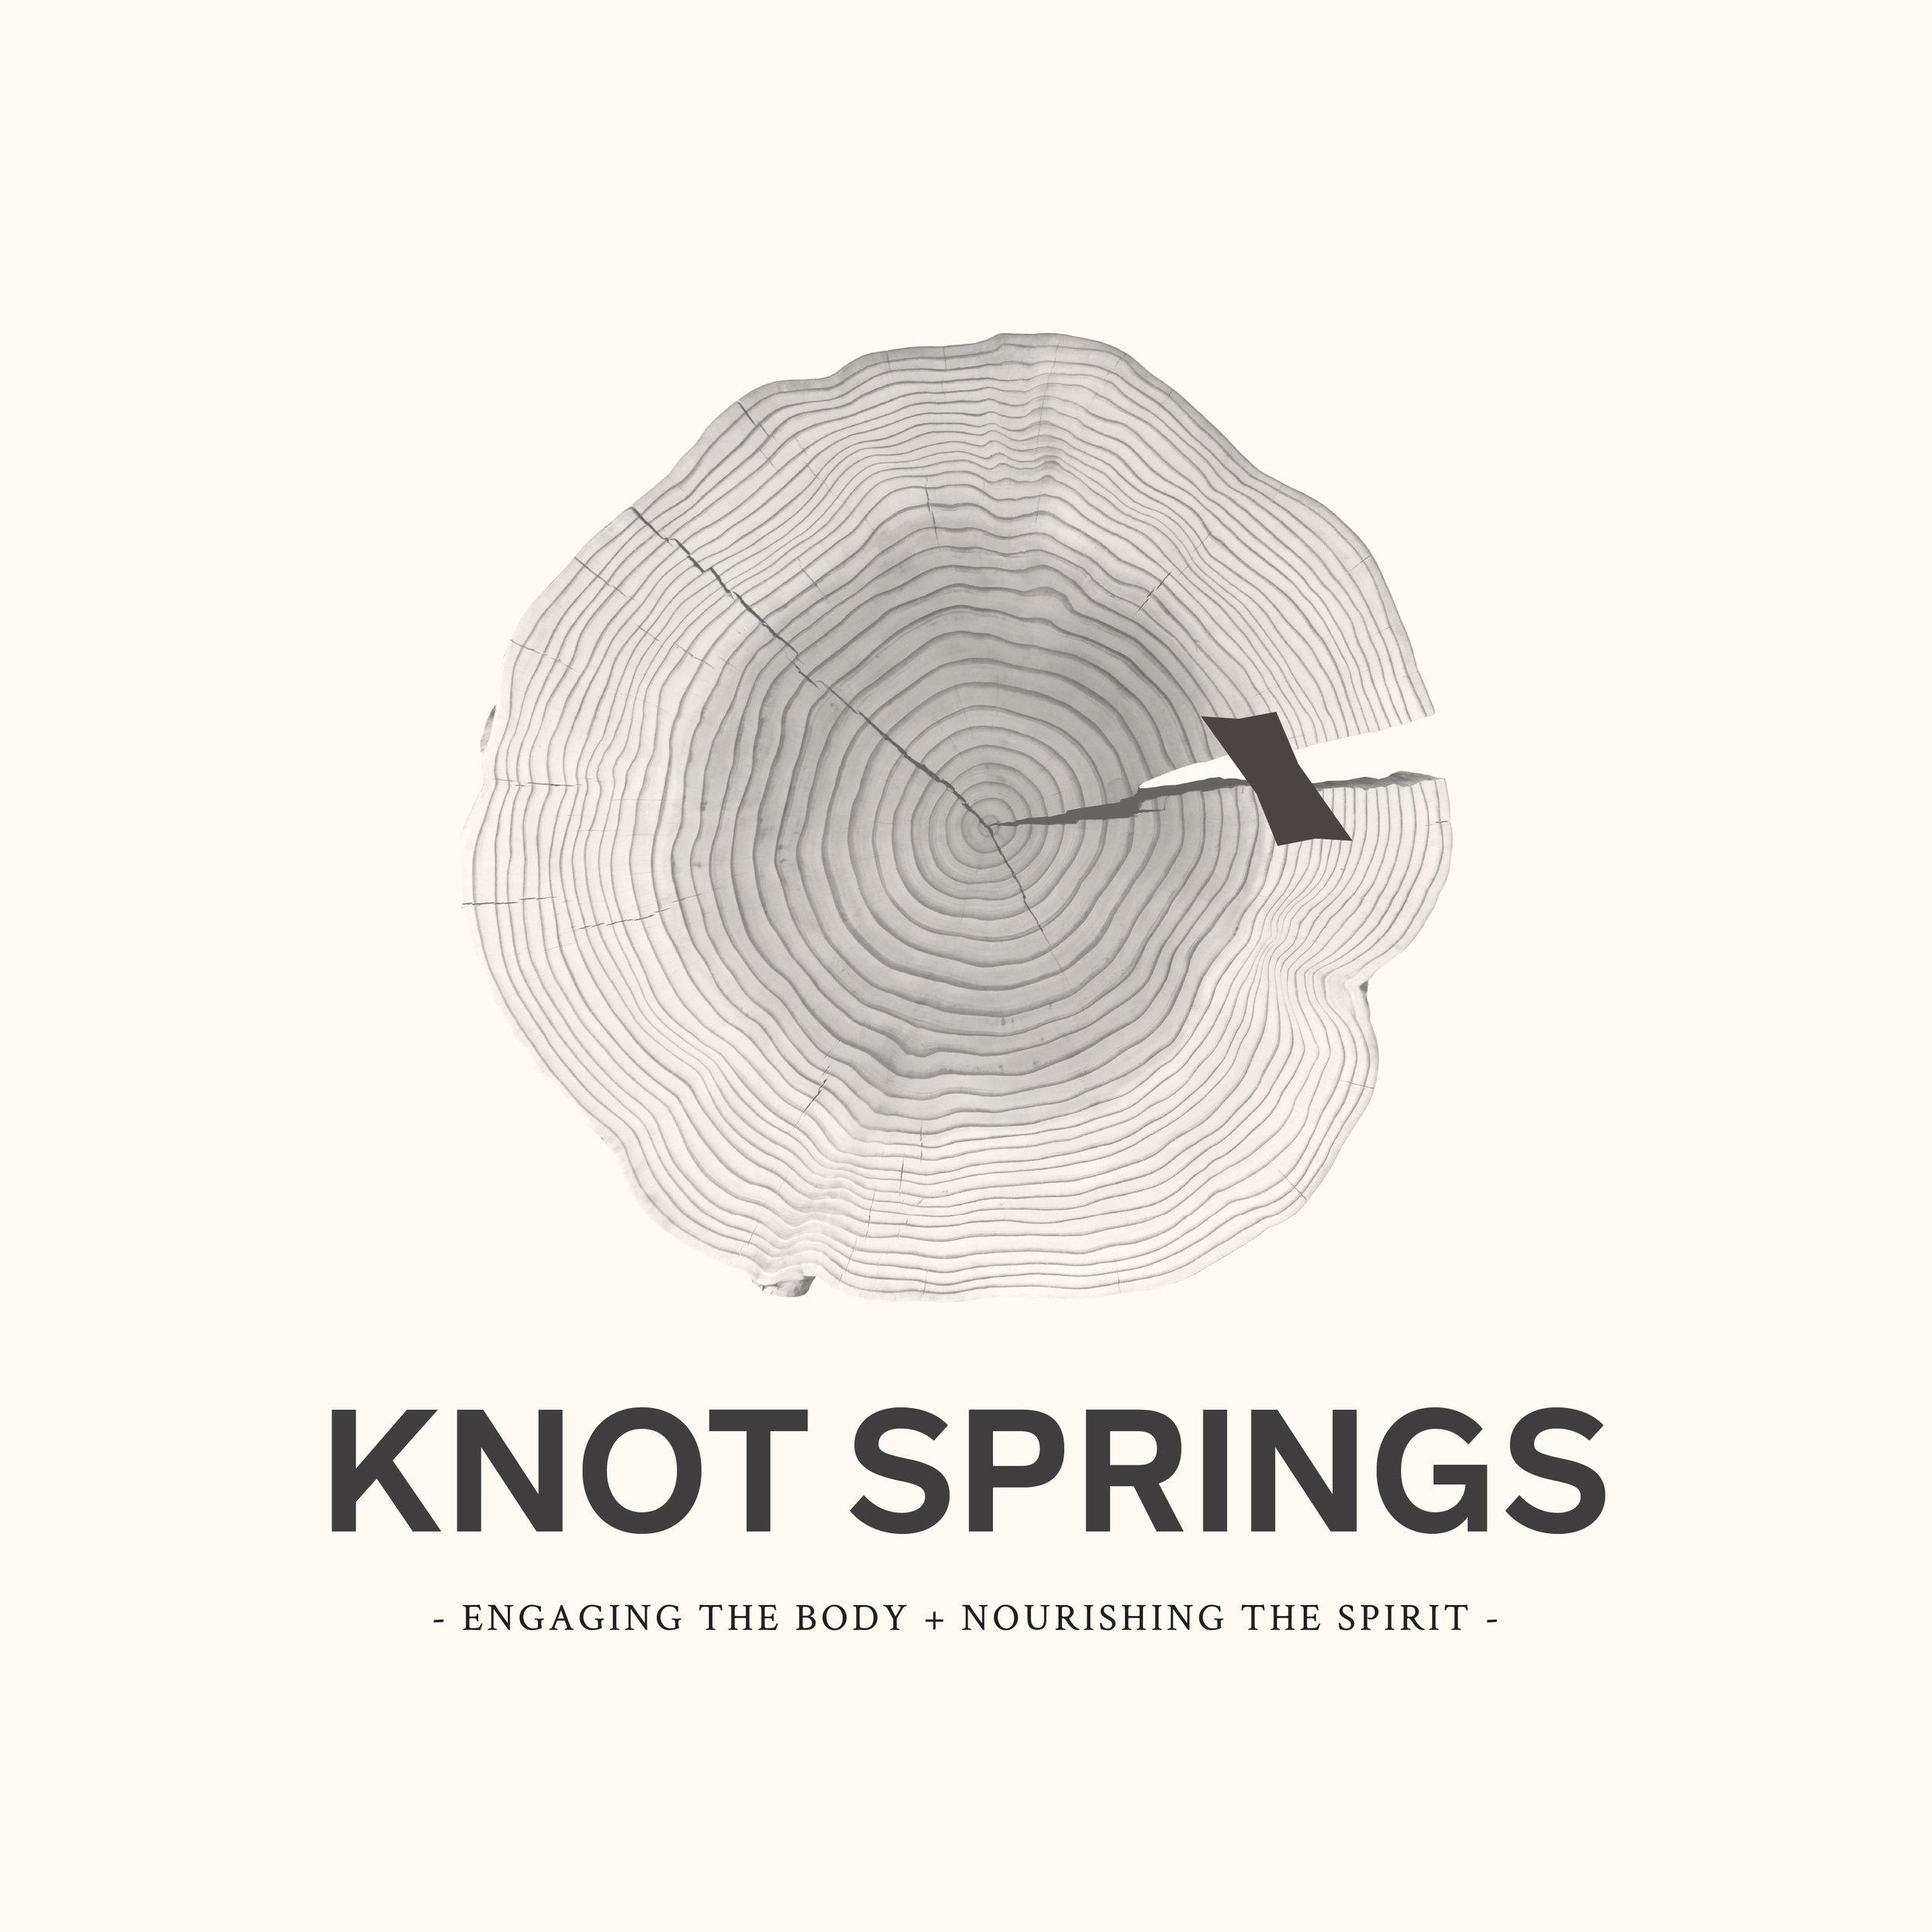 knot springs identity